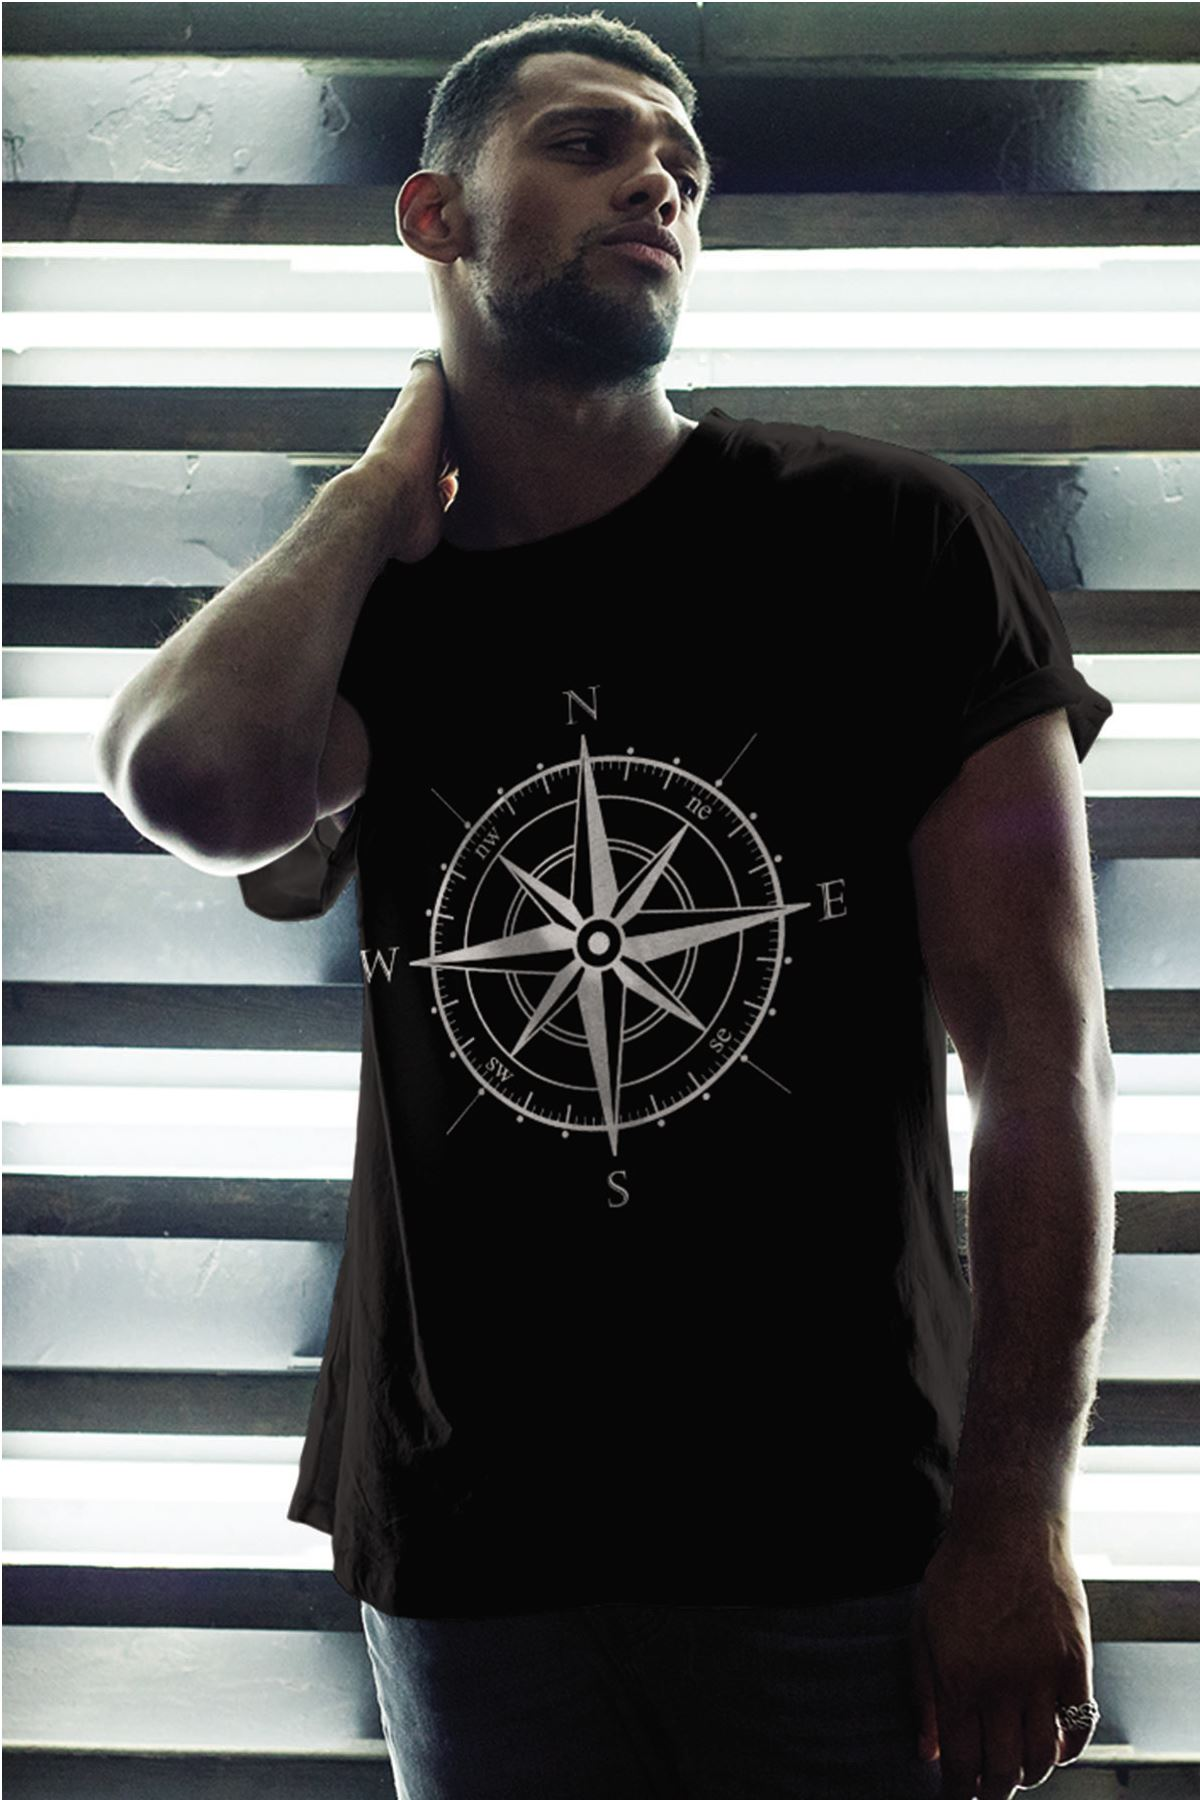 Pusula Siyah Erkek Oversize Tshirt - Tişört